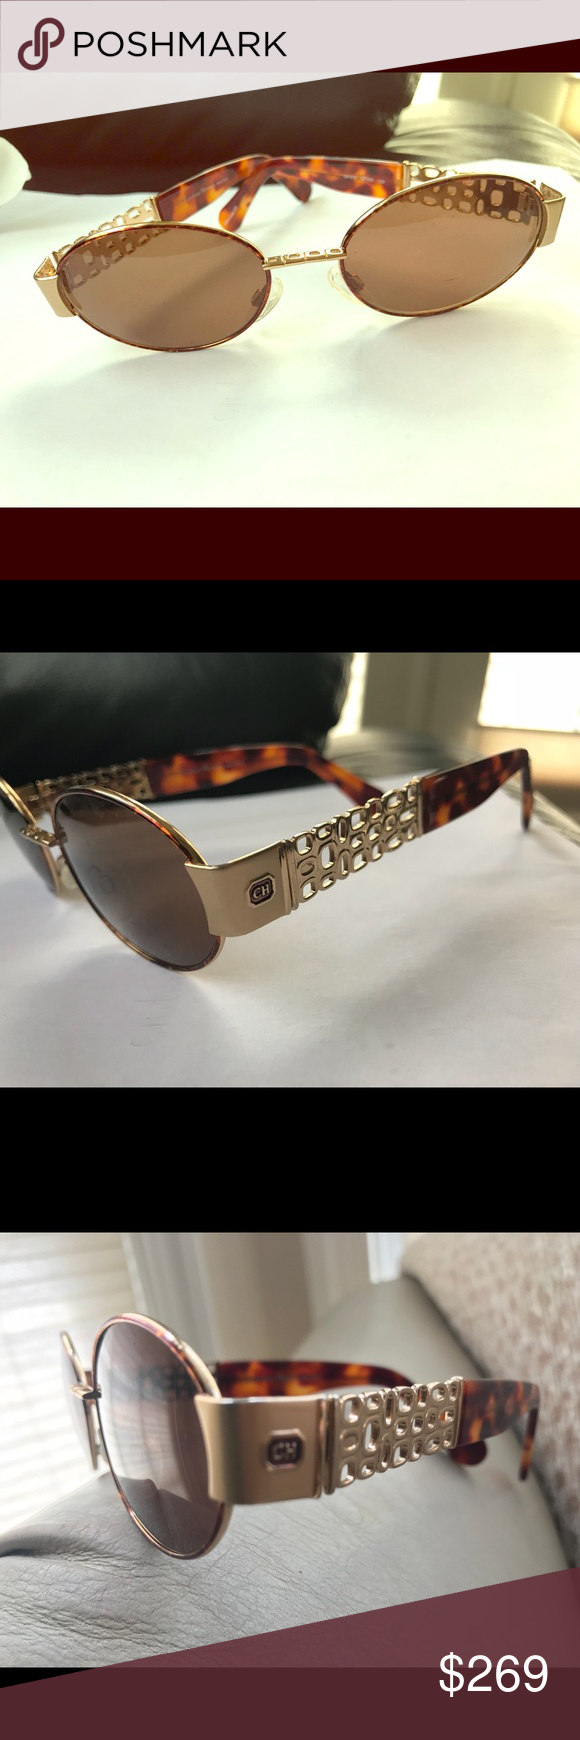 06e2cbab31ef Carolina Herrera sunglasses Rare hard to find! Authentic Carolina Herrera  Designer sunglasses. Ch315 Brown plastic lenses. Almost new. Sunglasses  only.